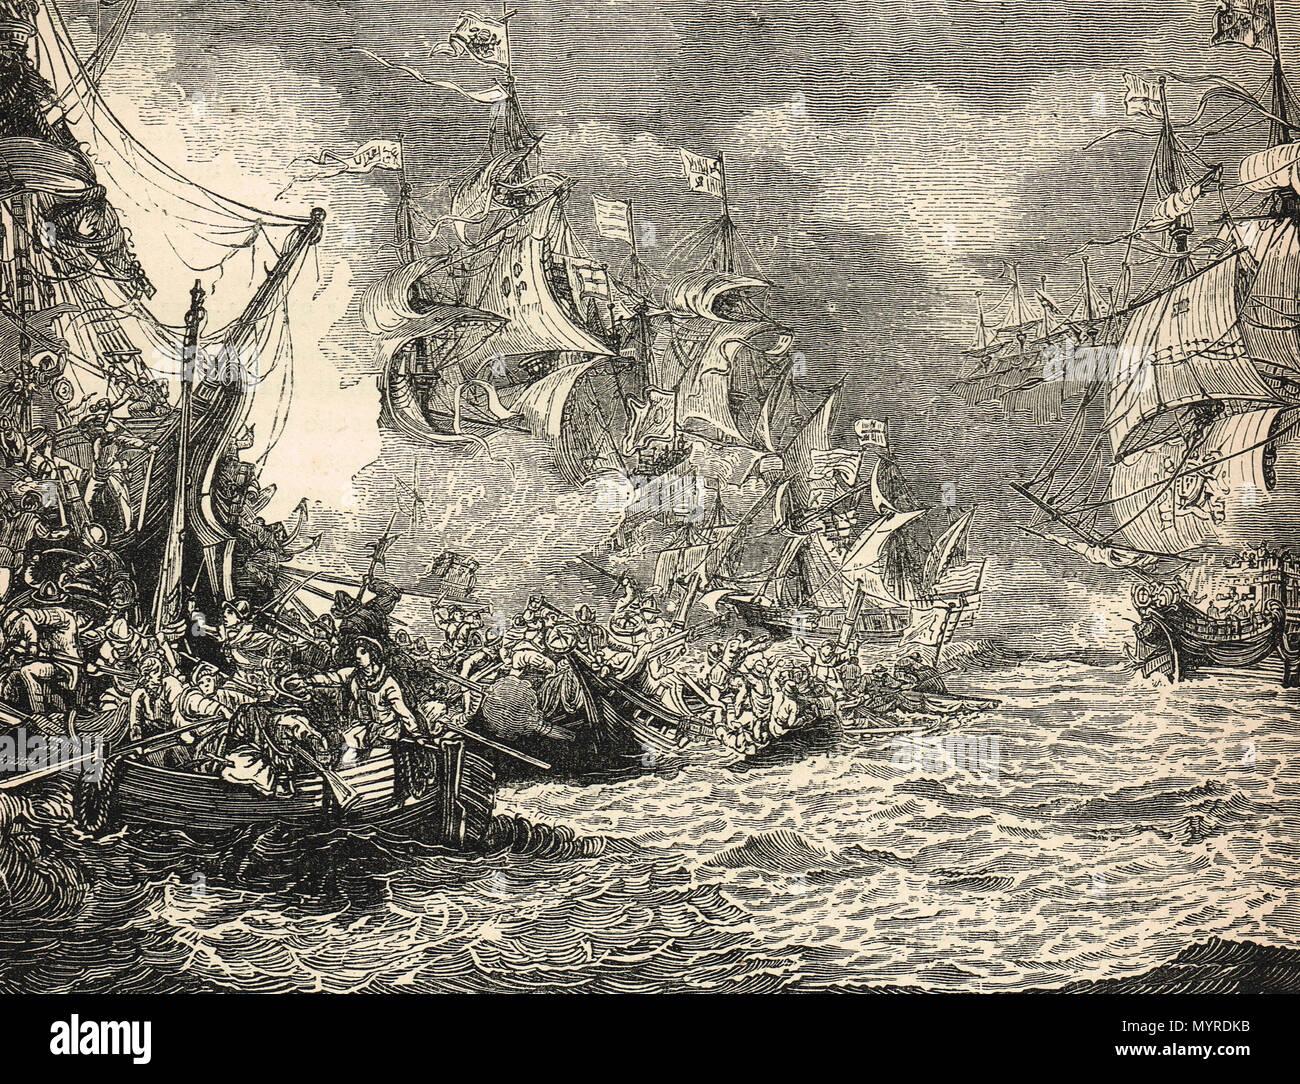 Defeat of the Spanish Armada, 1588 - Stock Image